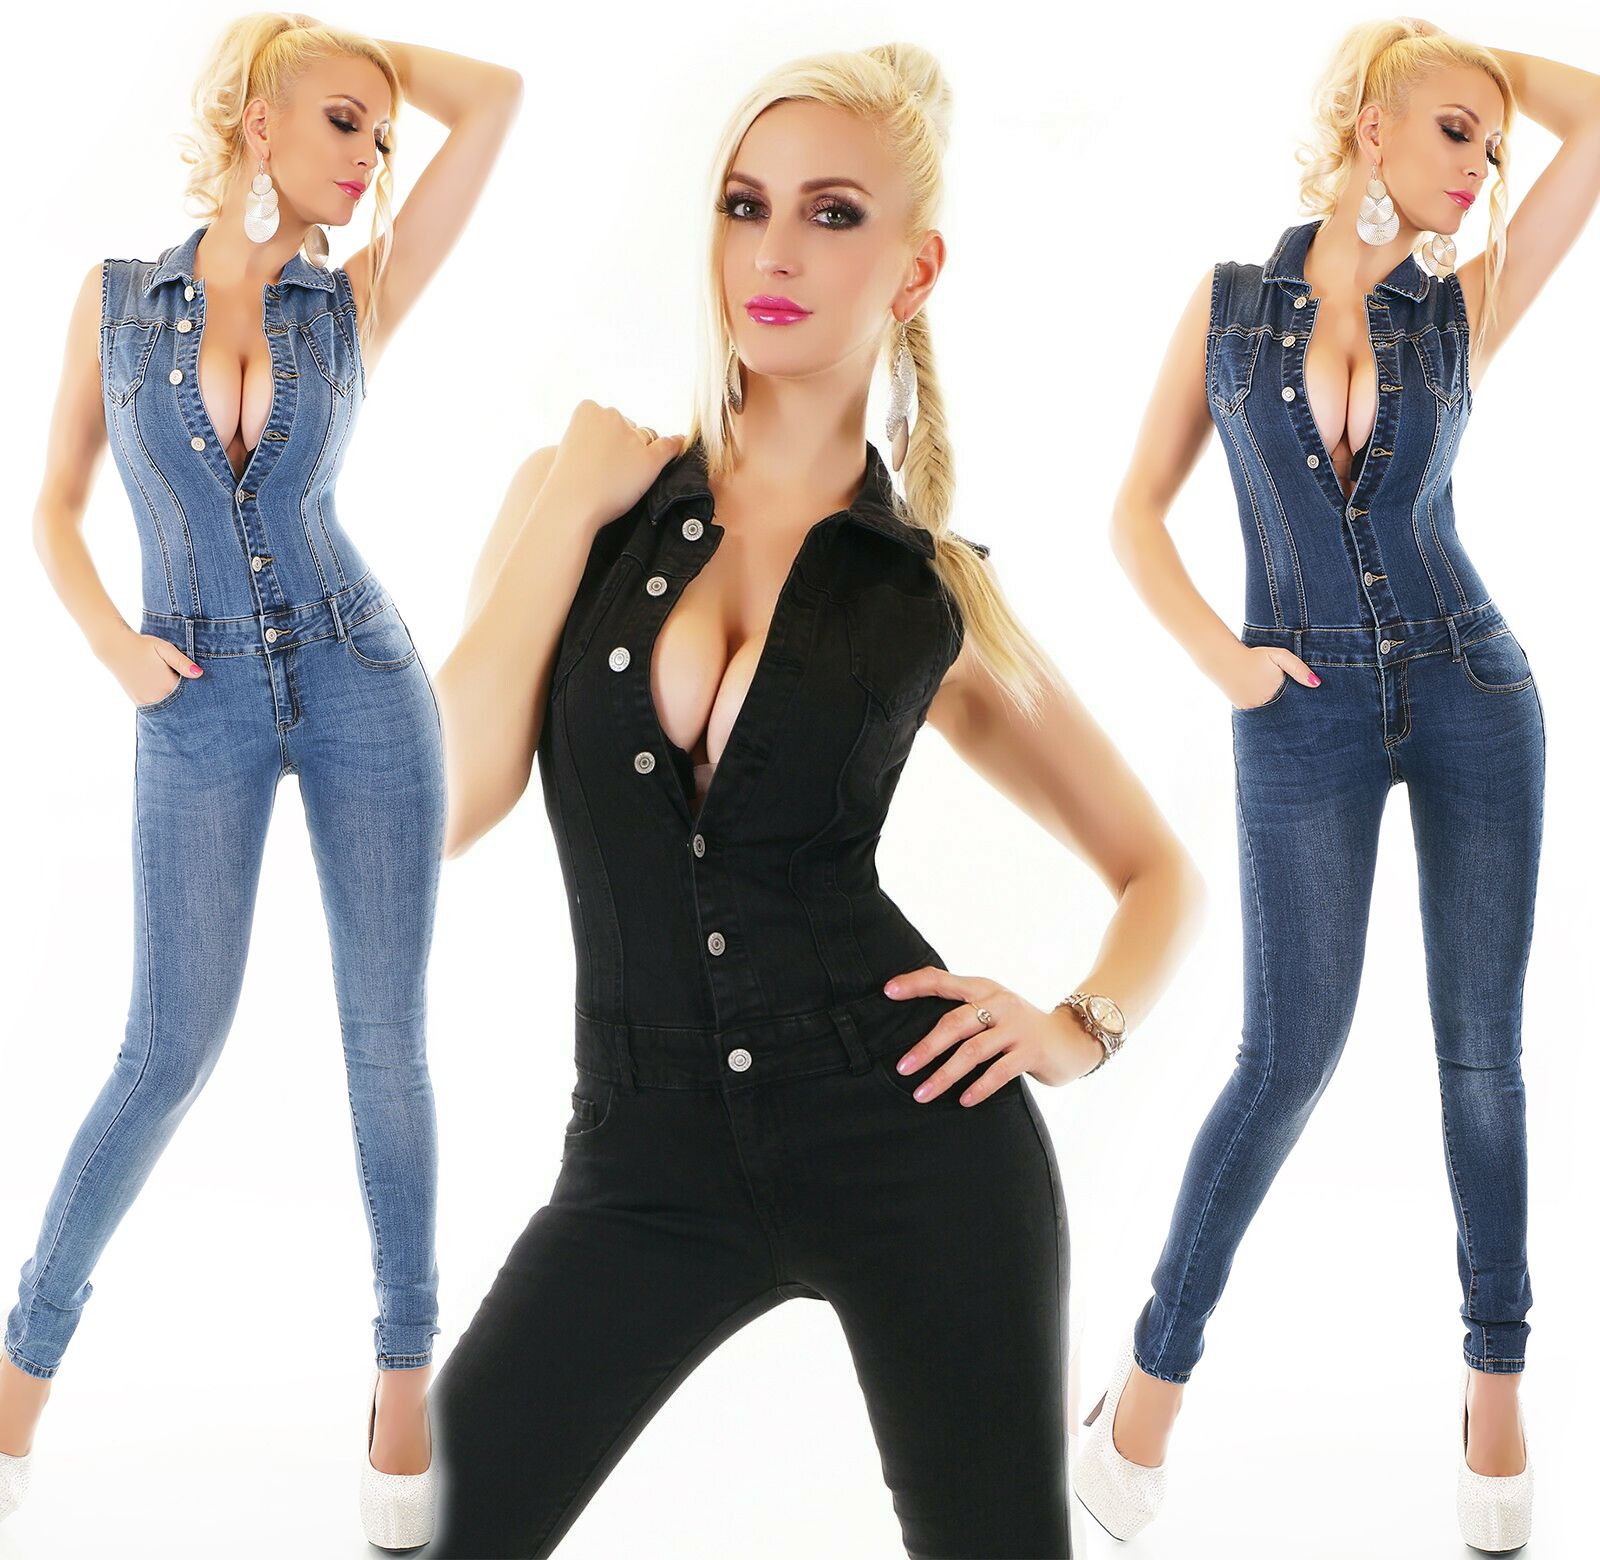 ORIGINAL Damen Hotpants Jeans Overall Einteiler Catsuit Häkel Spitze Fransen